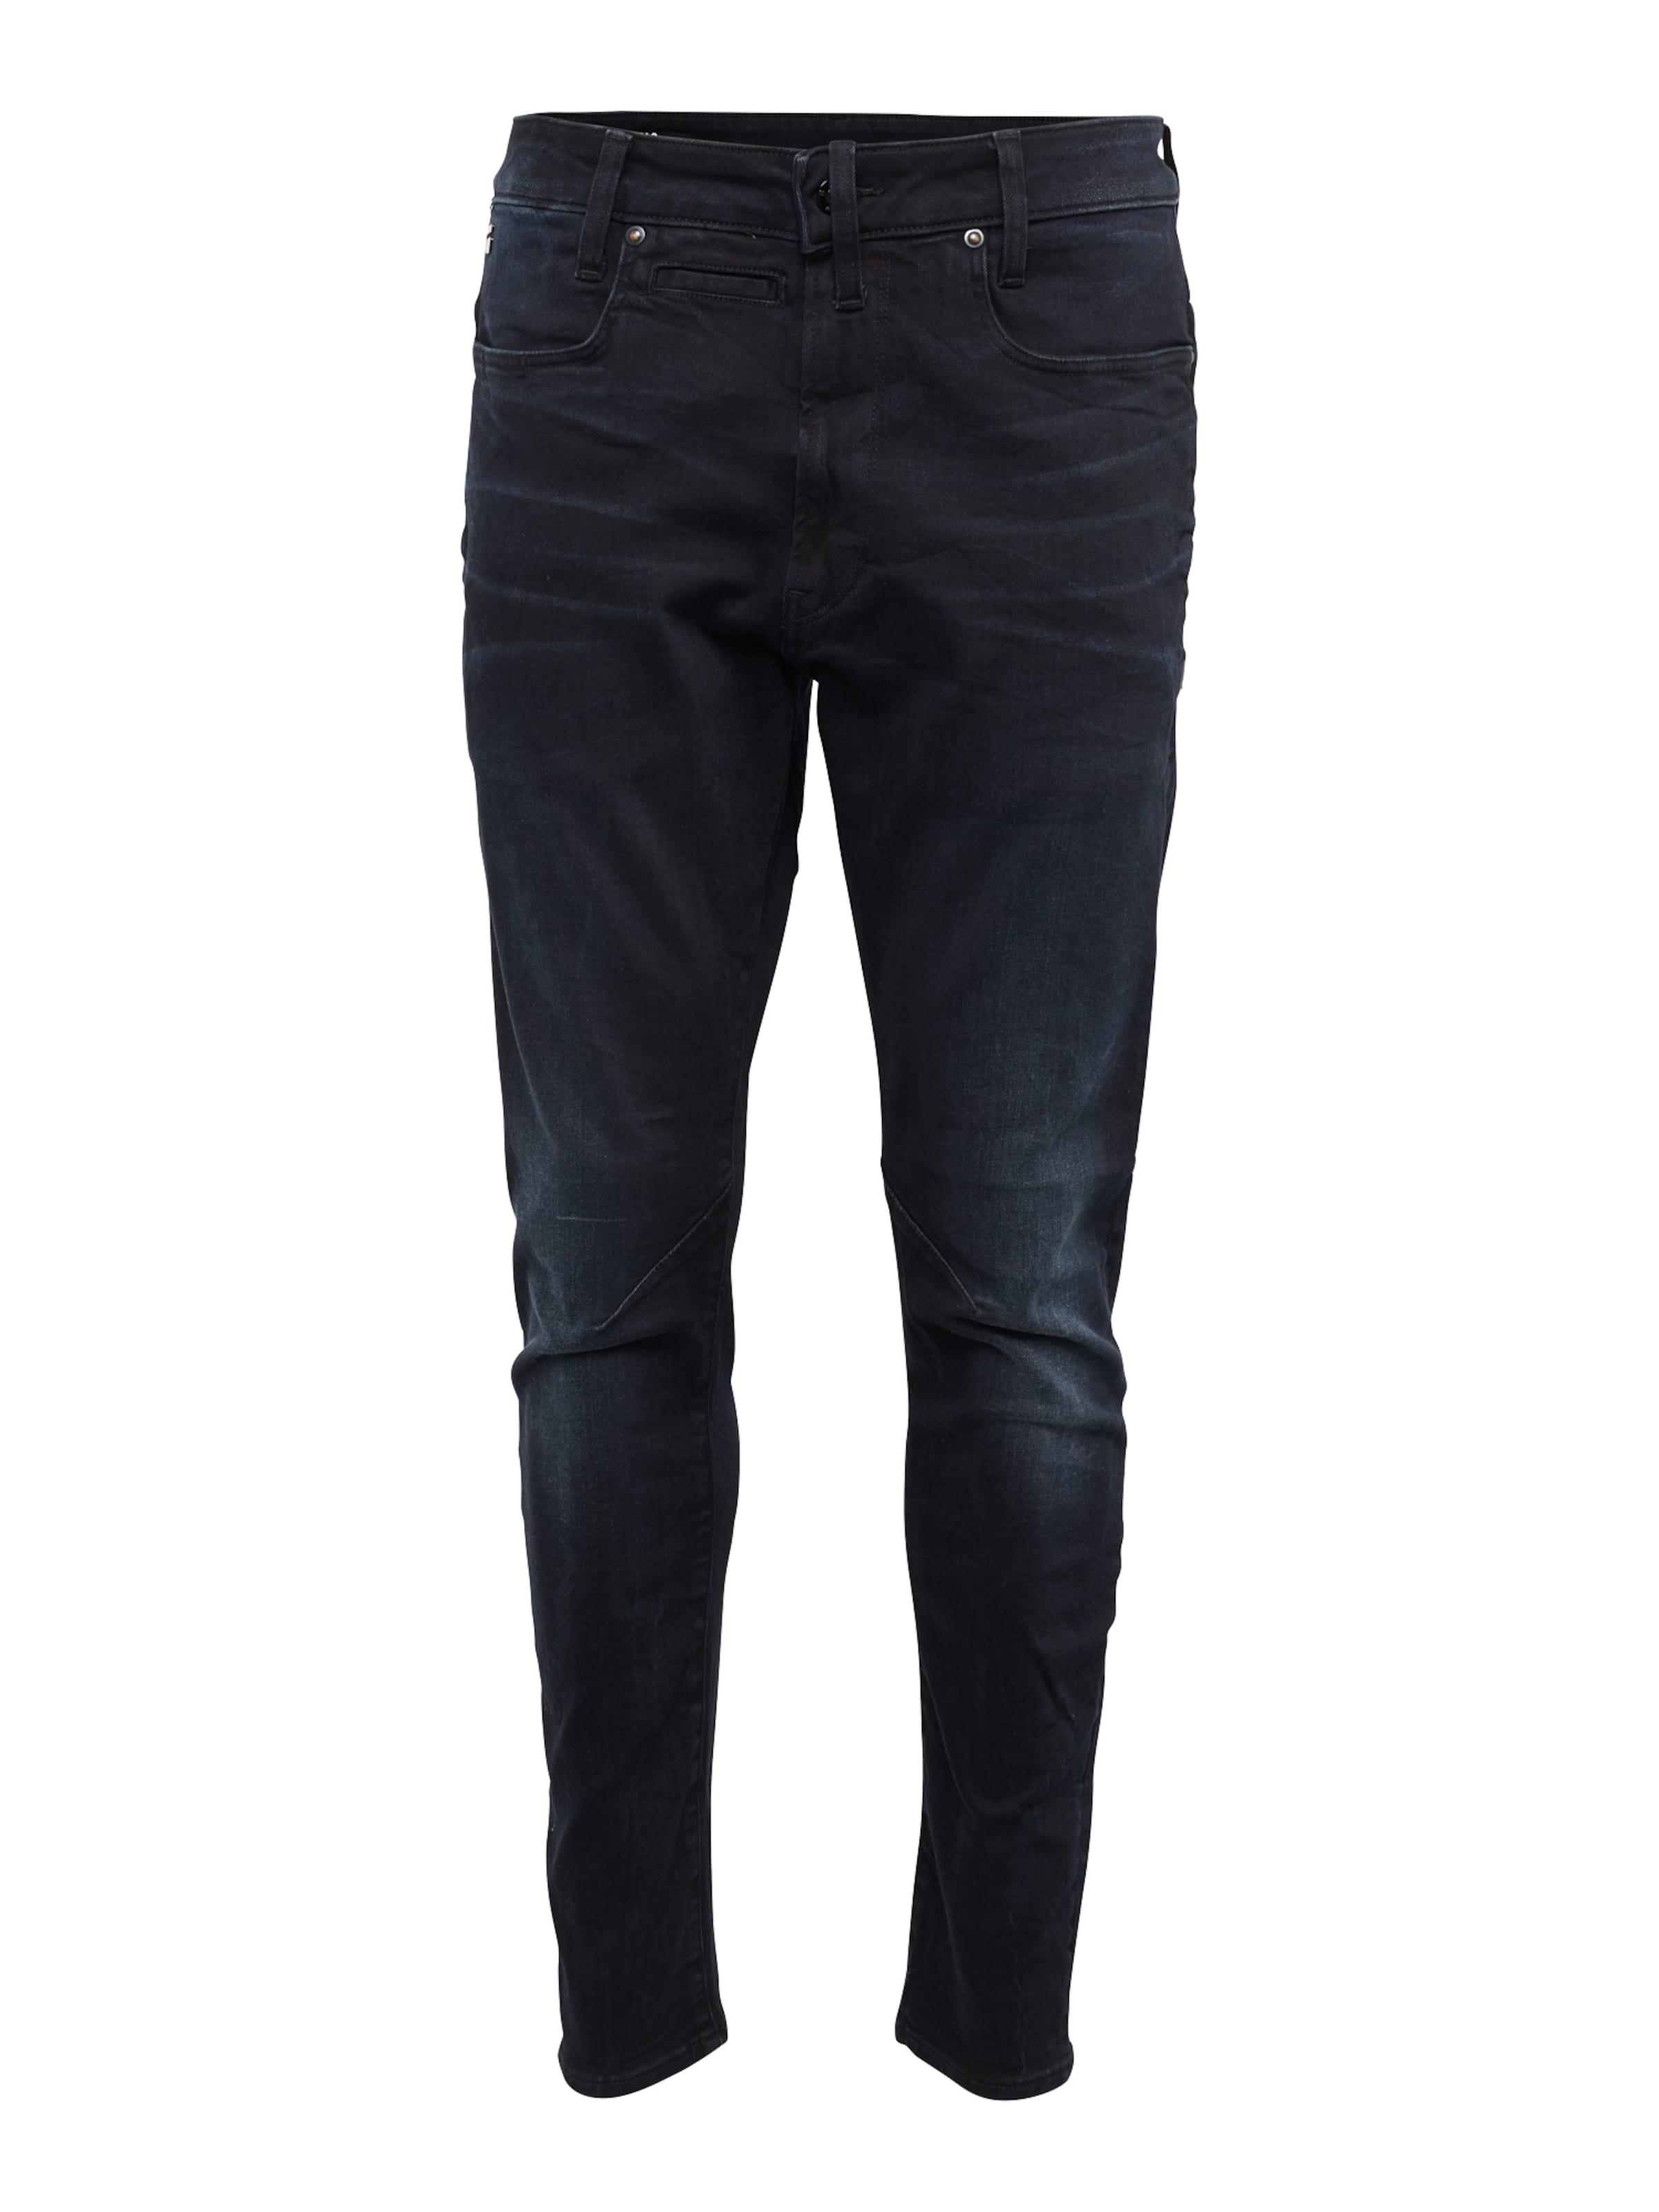 star Raw 'd staq Jeans G Kobaltblau 3d' In b76vgIYfy